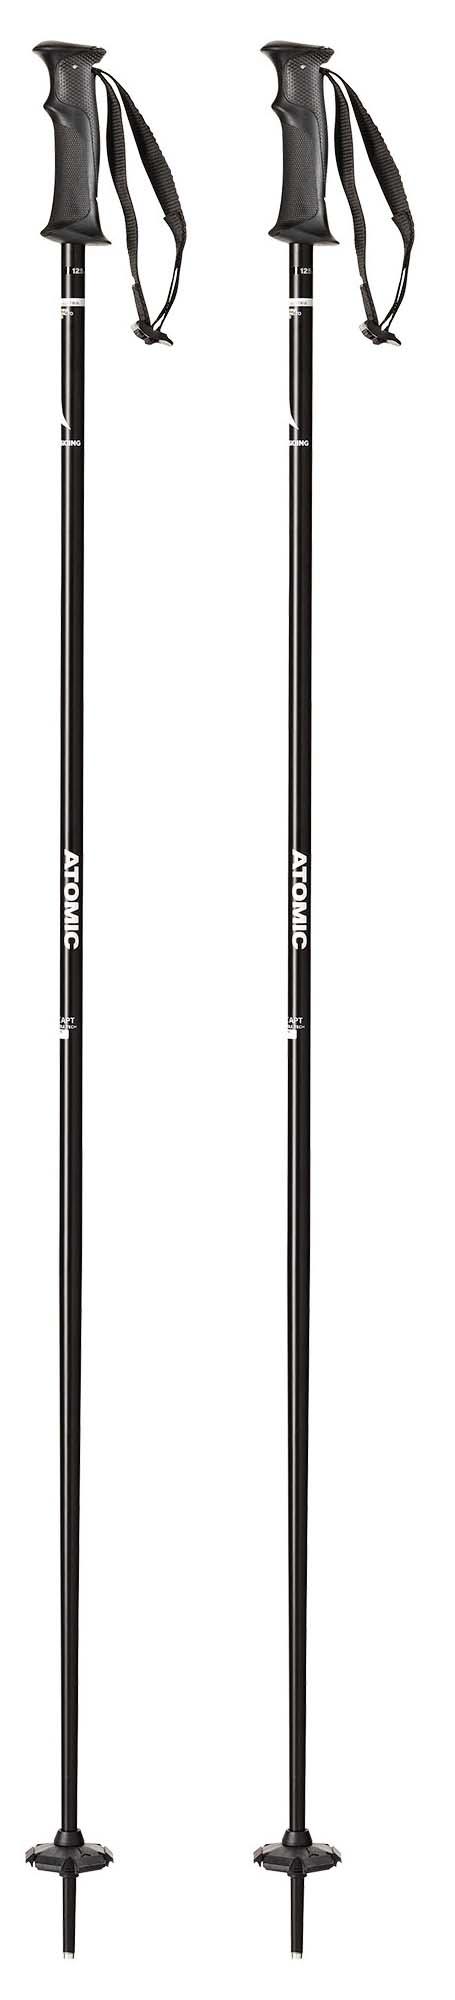 Atomic 2020 Cloud W Blk/Wht Ski Poles NEW !! 110cm